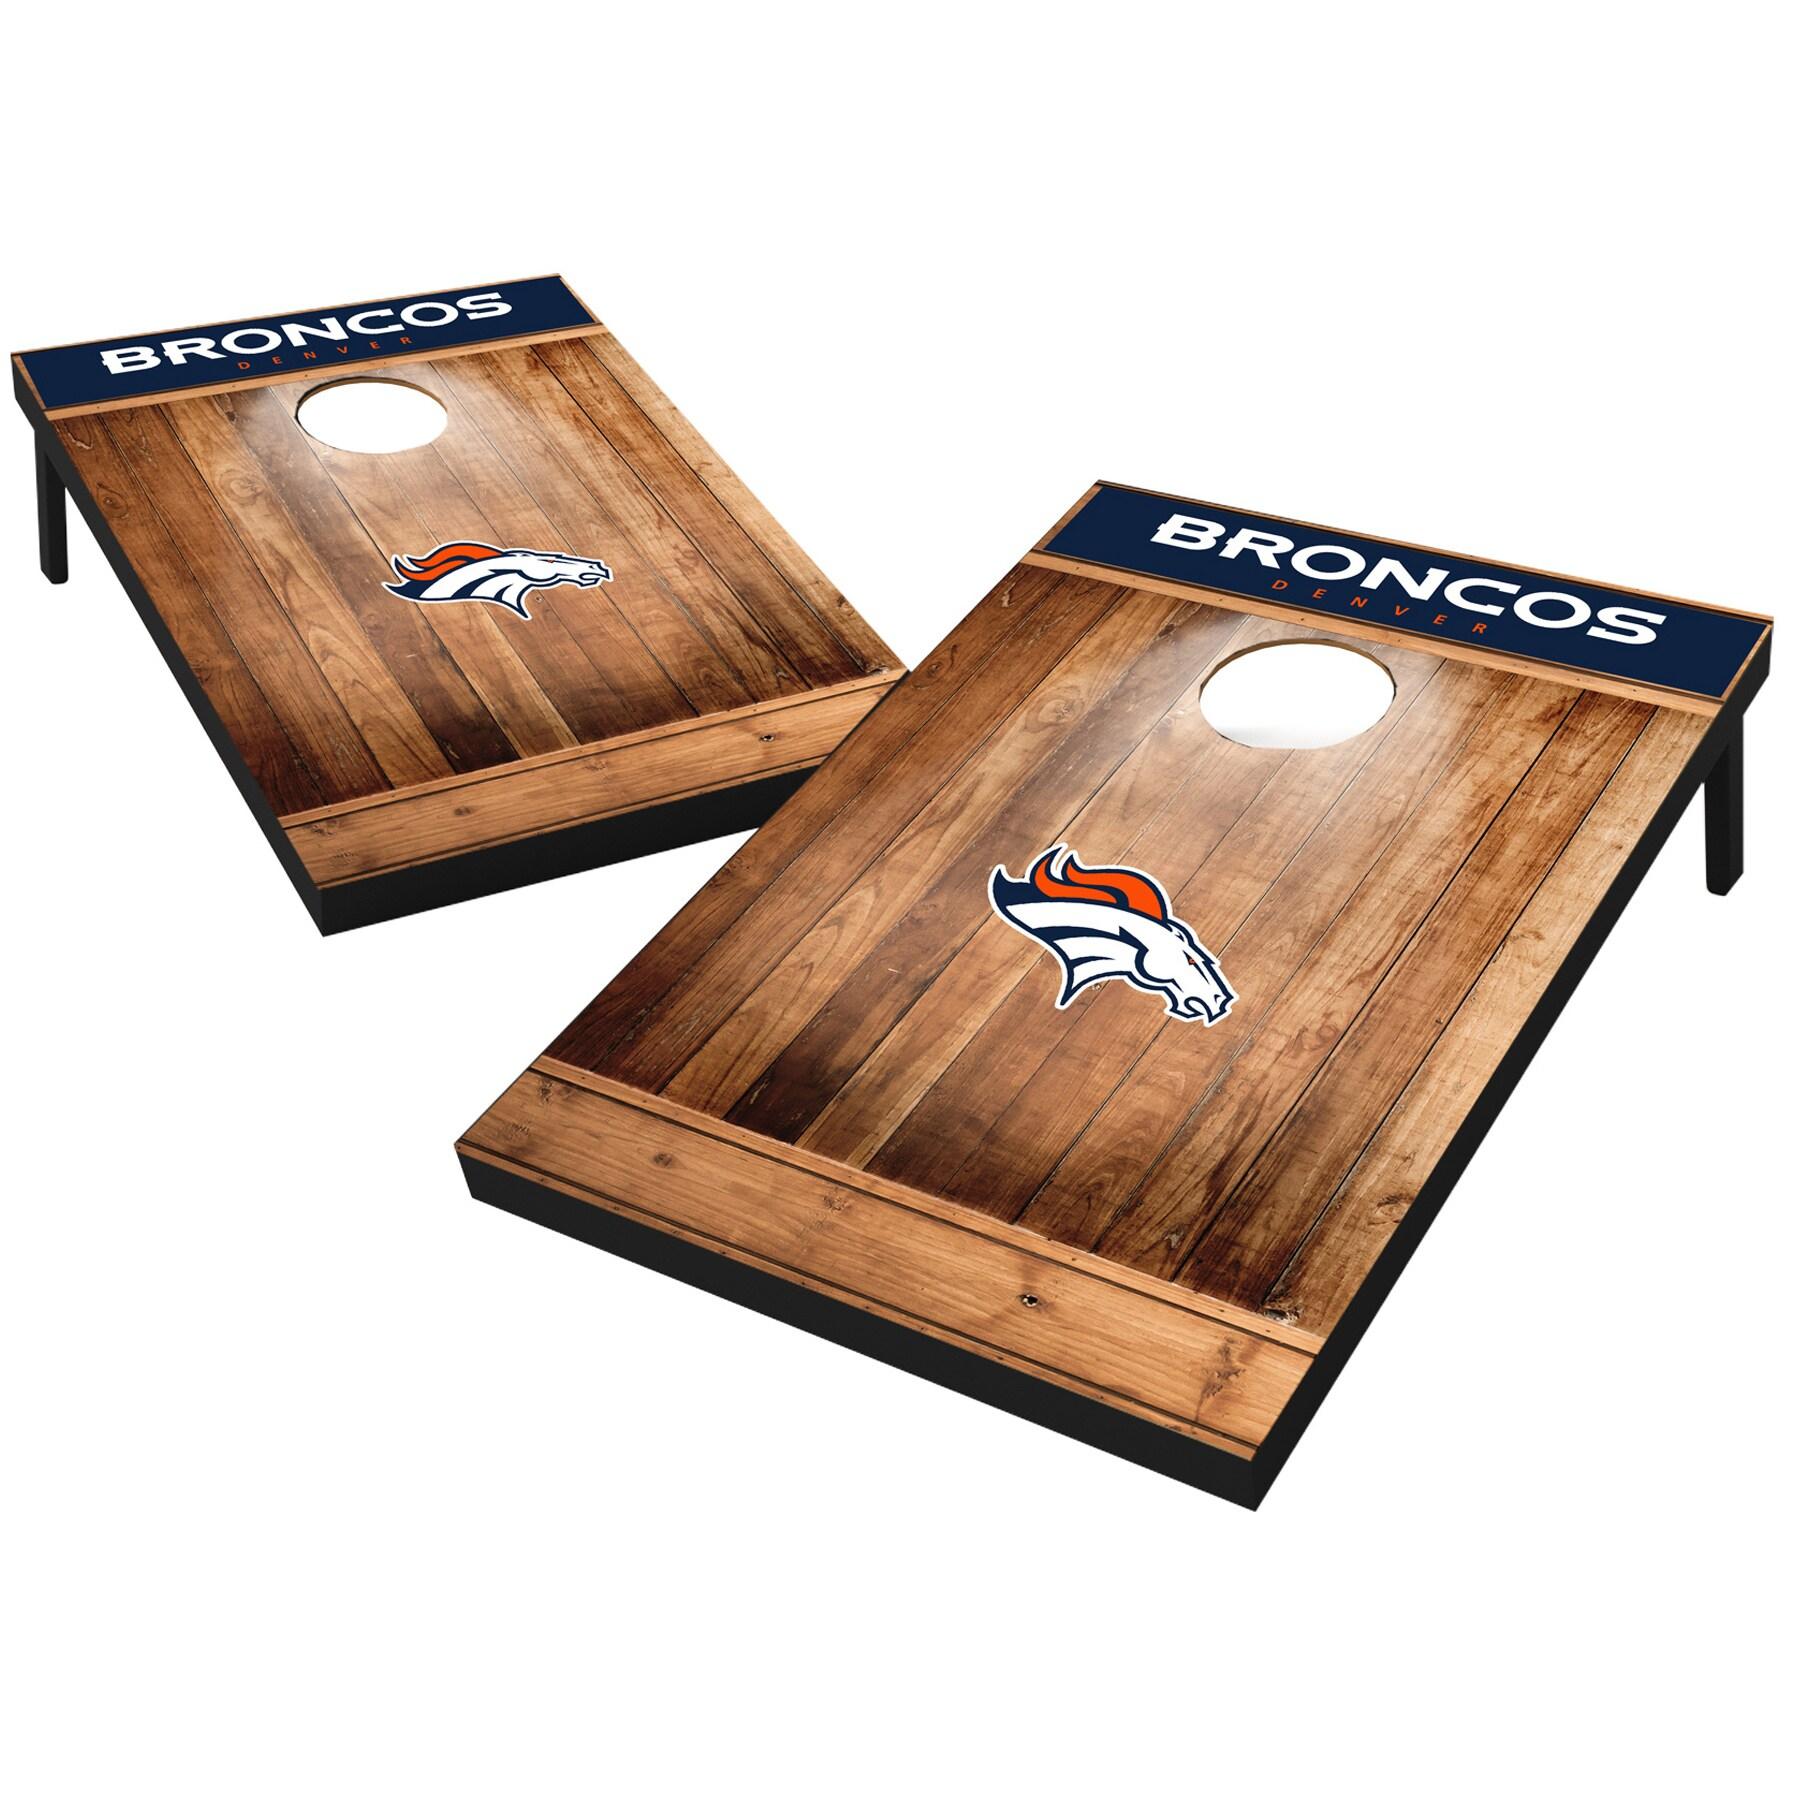 Denver Broncos 2' x 3' Wood Design Cornhole Board Tailgate Toss Set